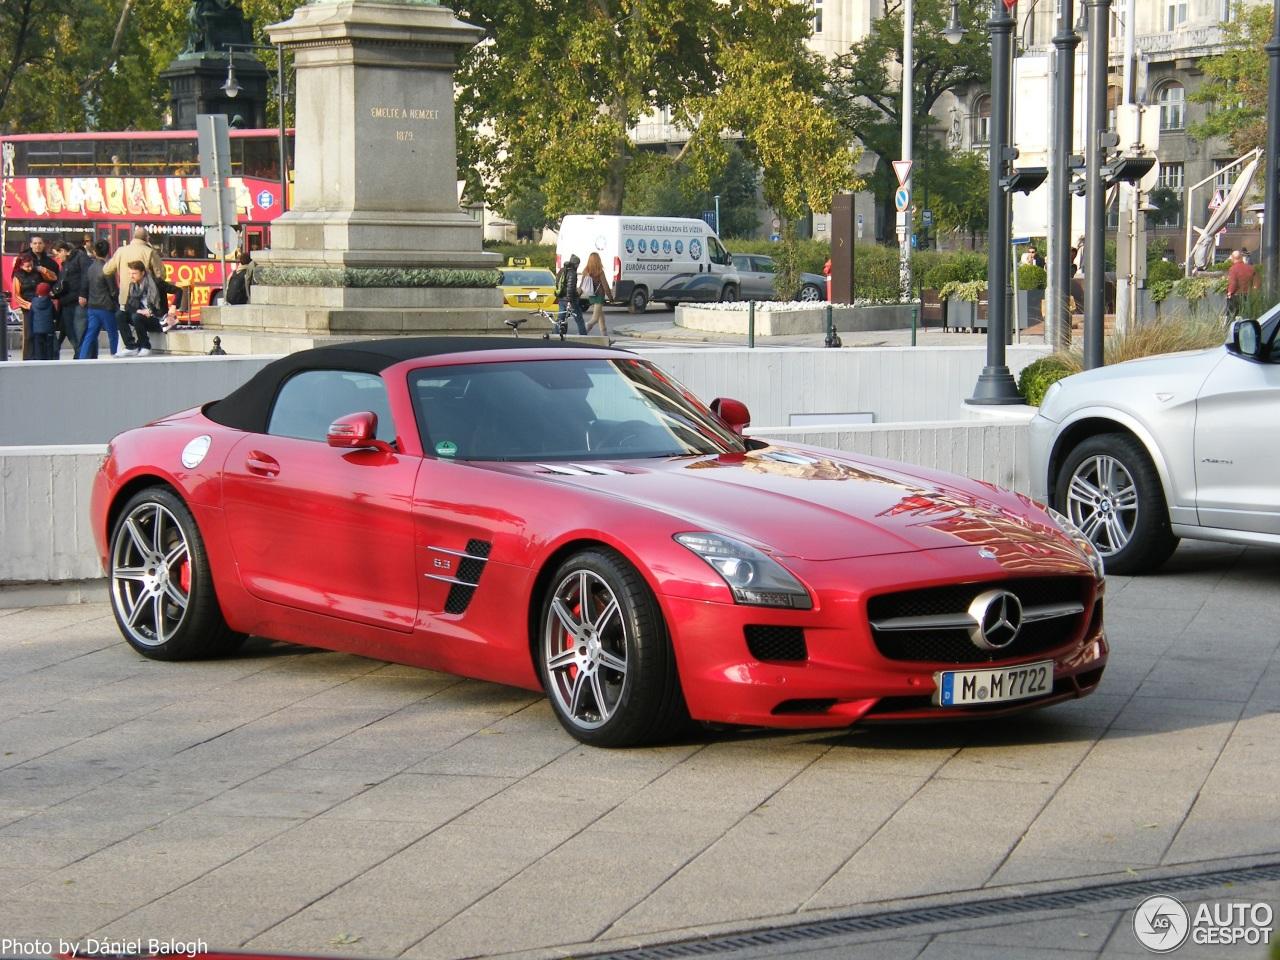 Mercedes benz sls amg roadster 27 october 2015 autogespot for 2015 mercedes benz sls amg convertible